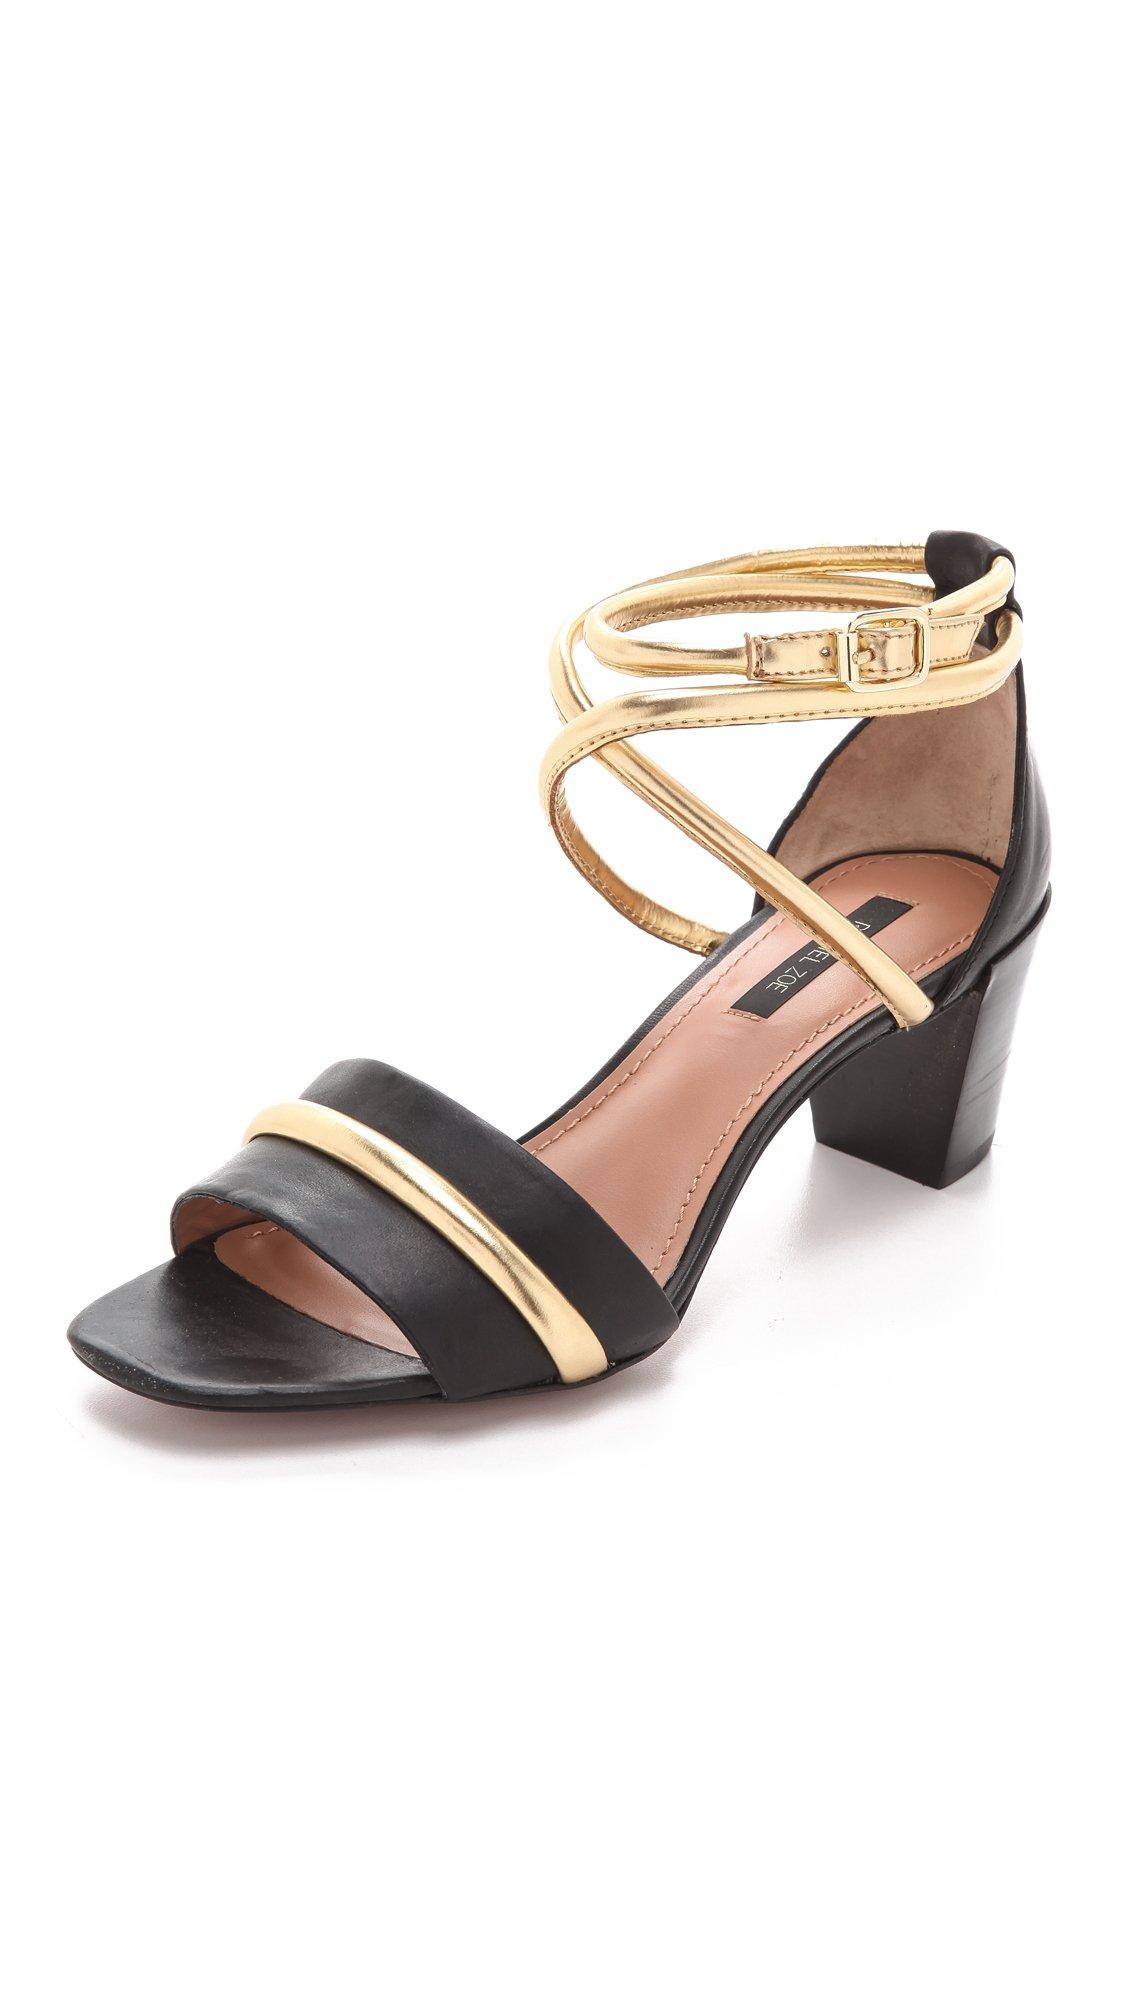 Original Nine West Yocelin Low Heel Dress Sandals In Black  Lyst